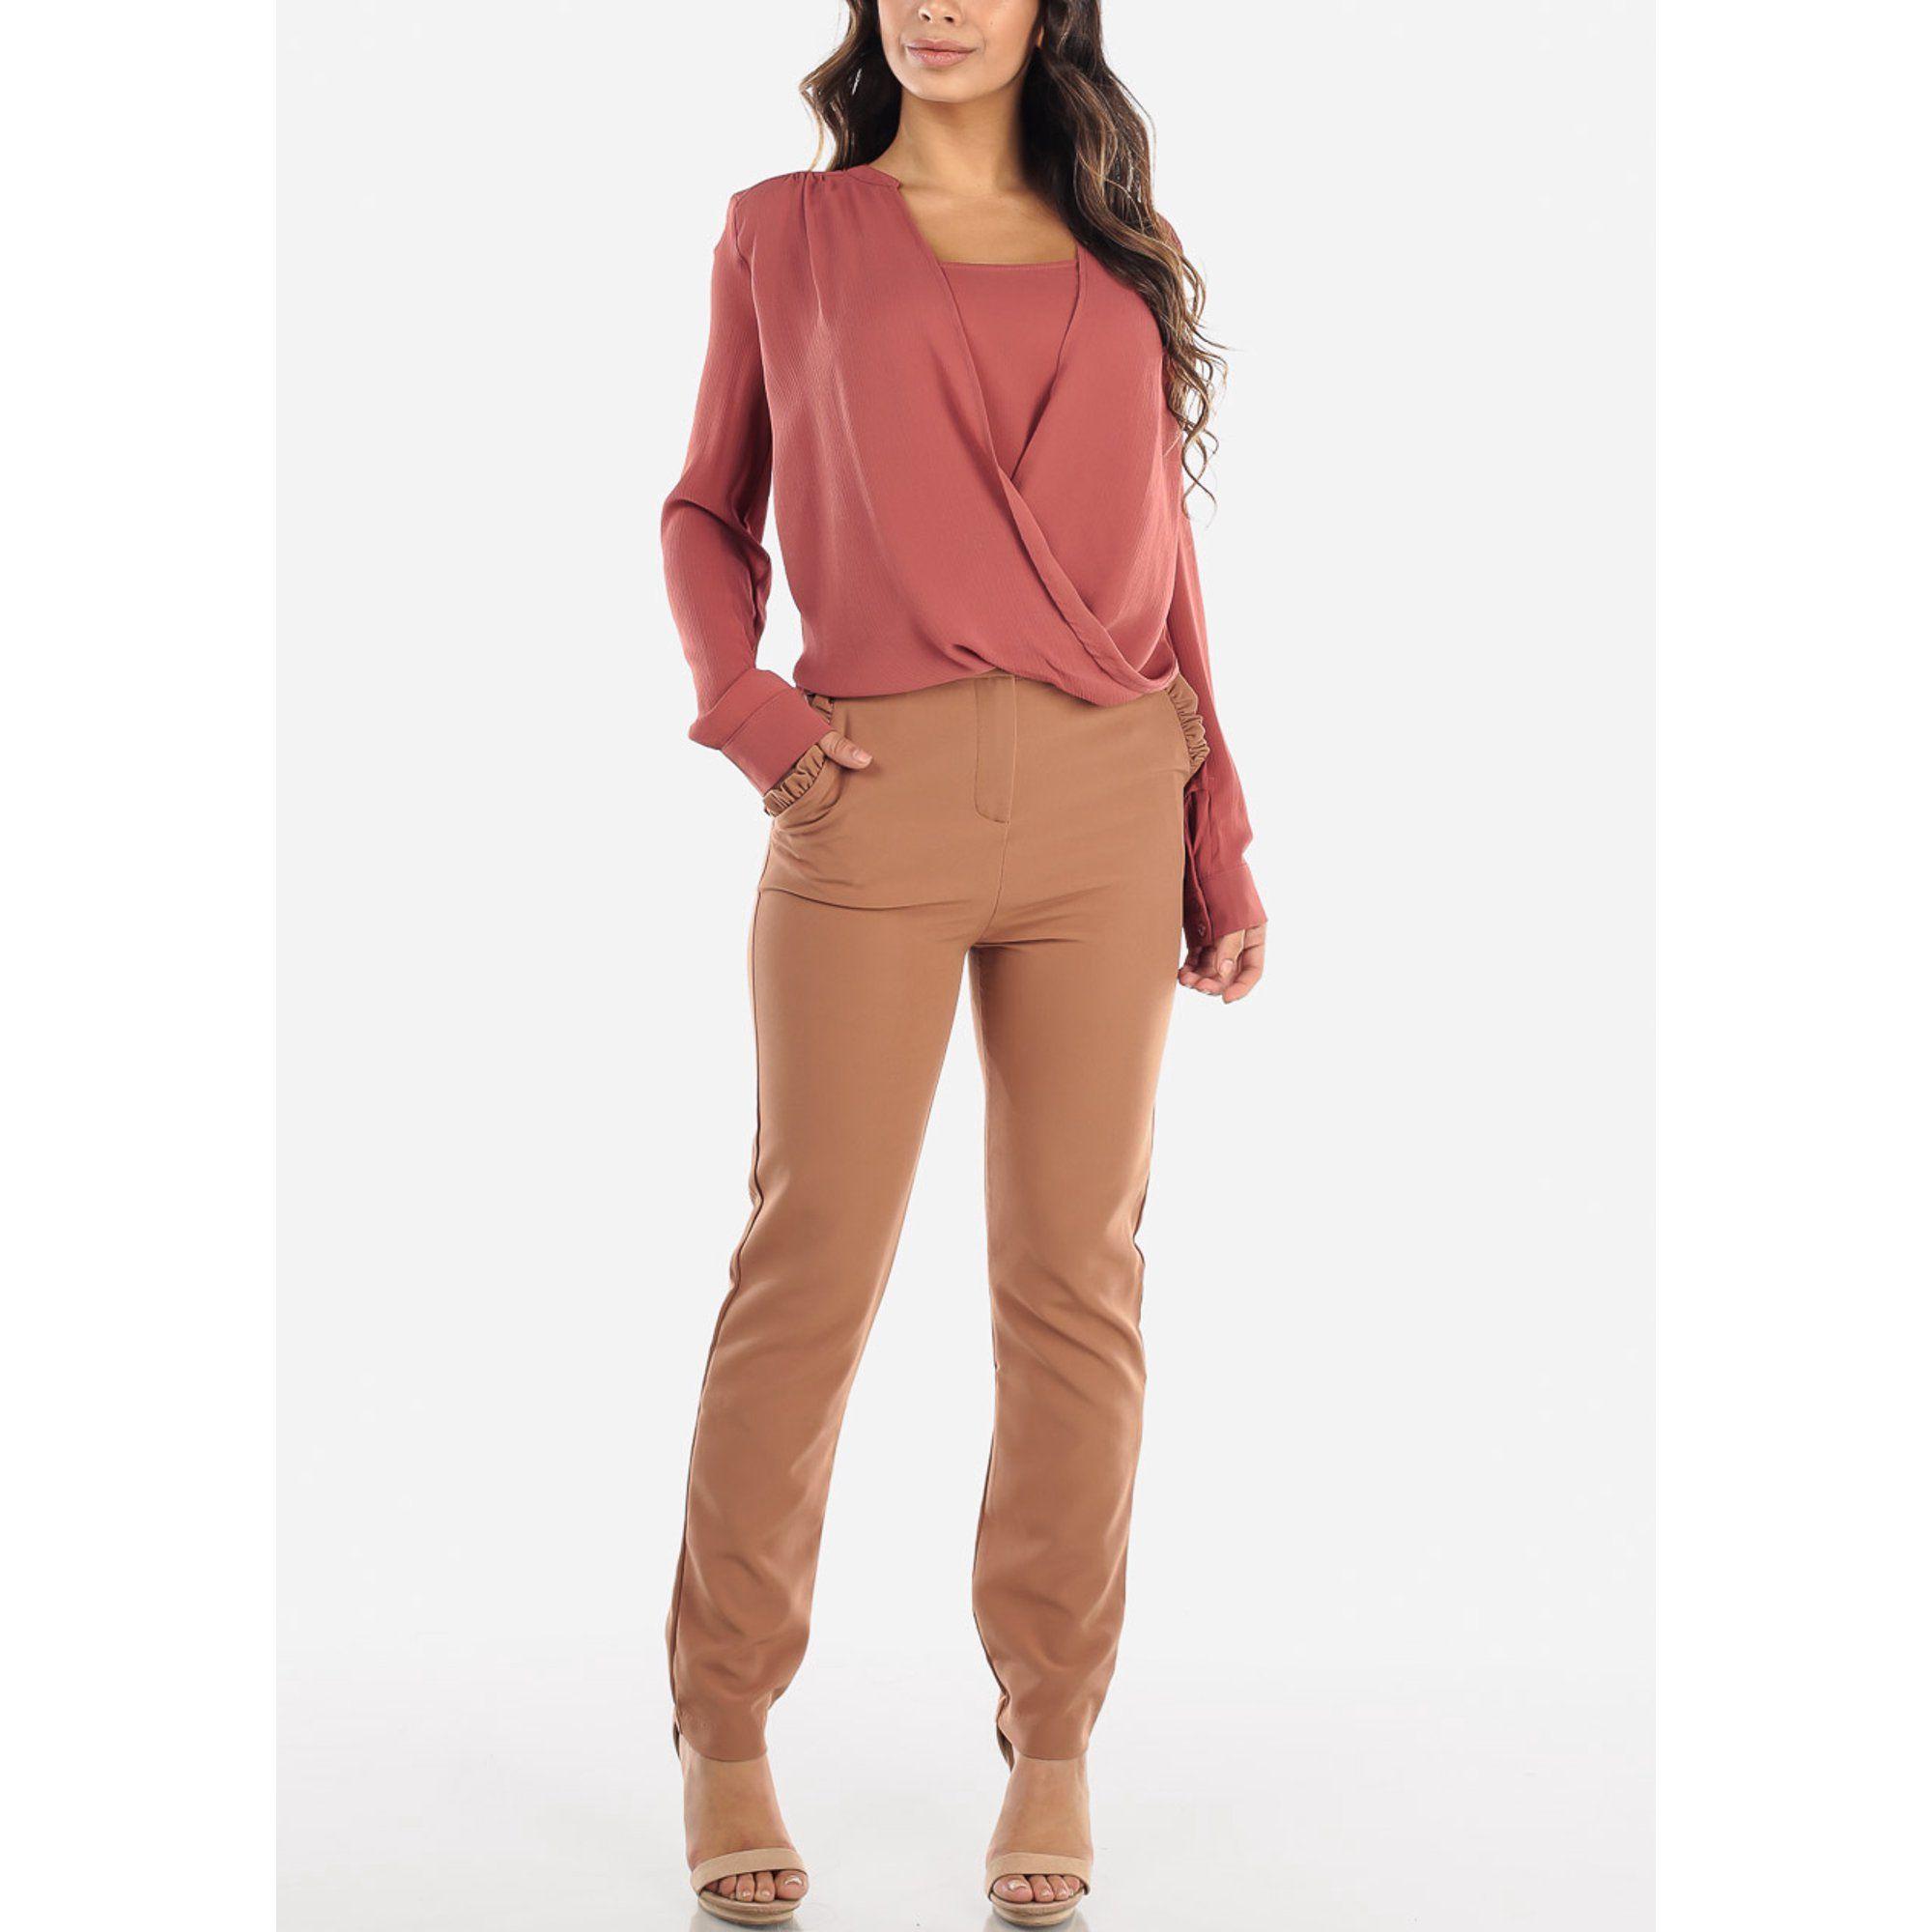 Moda Xpress Womens High Waisted Pants Straight Leg Career Wear Dressy Mocha Pants 10032h Walmart Com High Waisted Pants Career Wear Straight Leg [ 2000 x 2000 Pixel ]